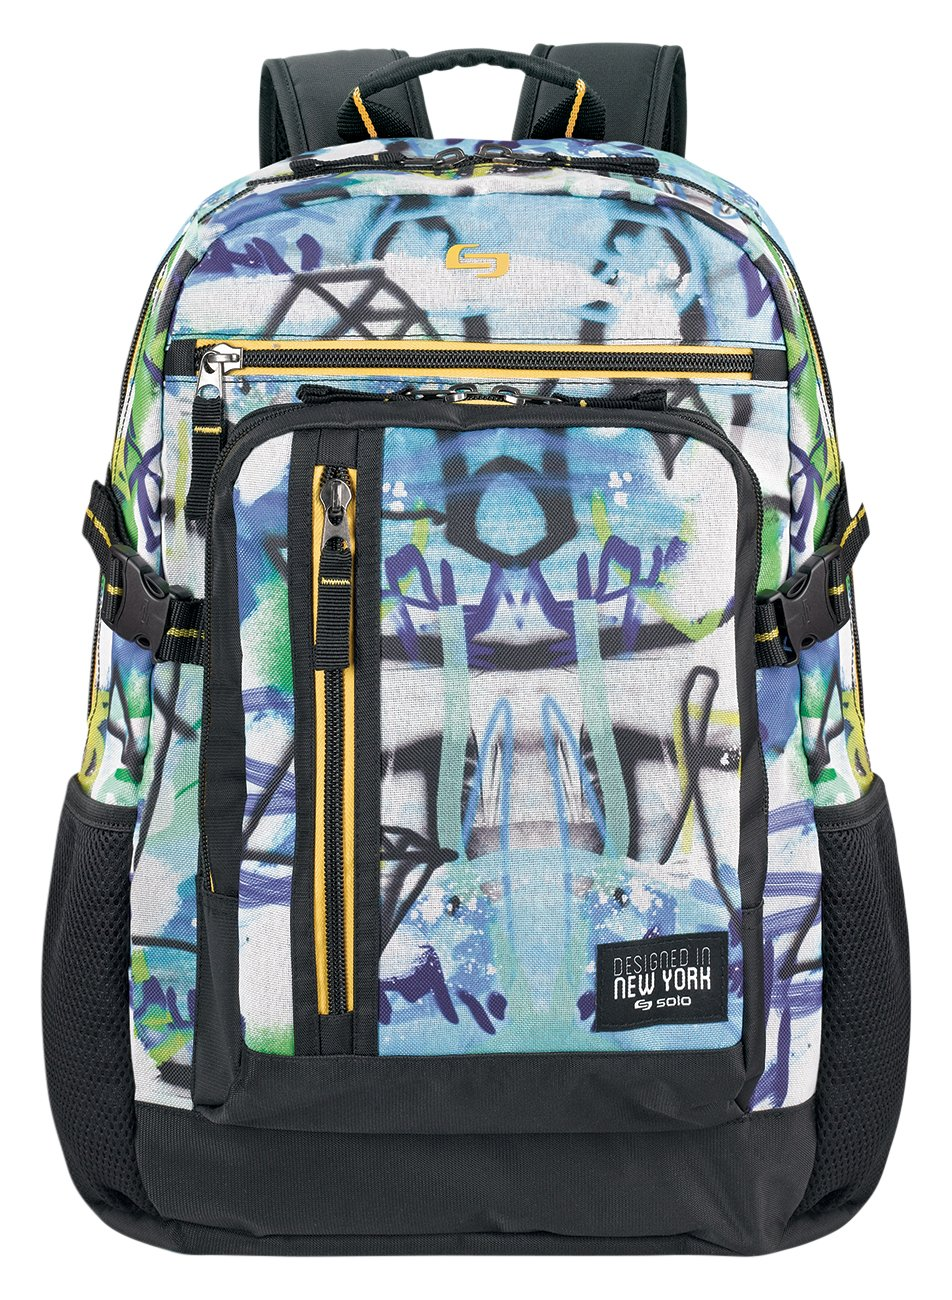 Solo Brooklyn 15.6 Laptop Backpack